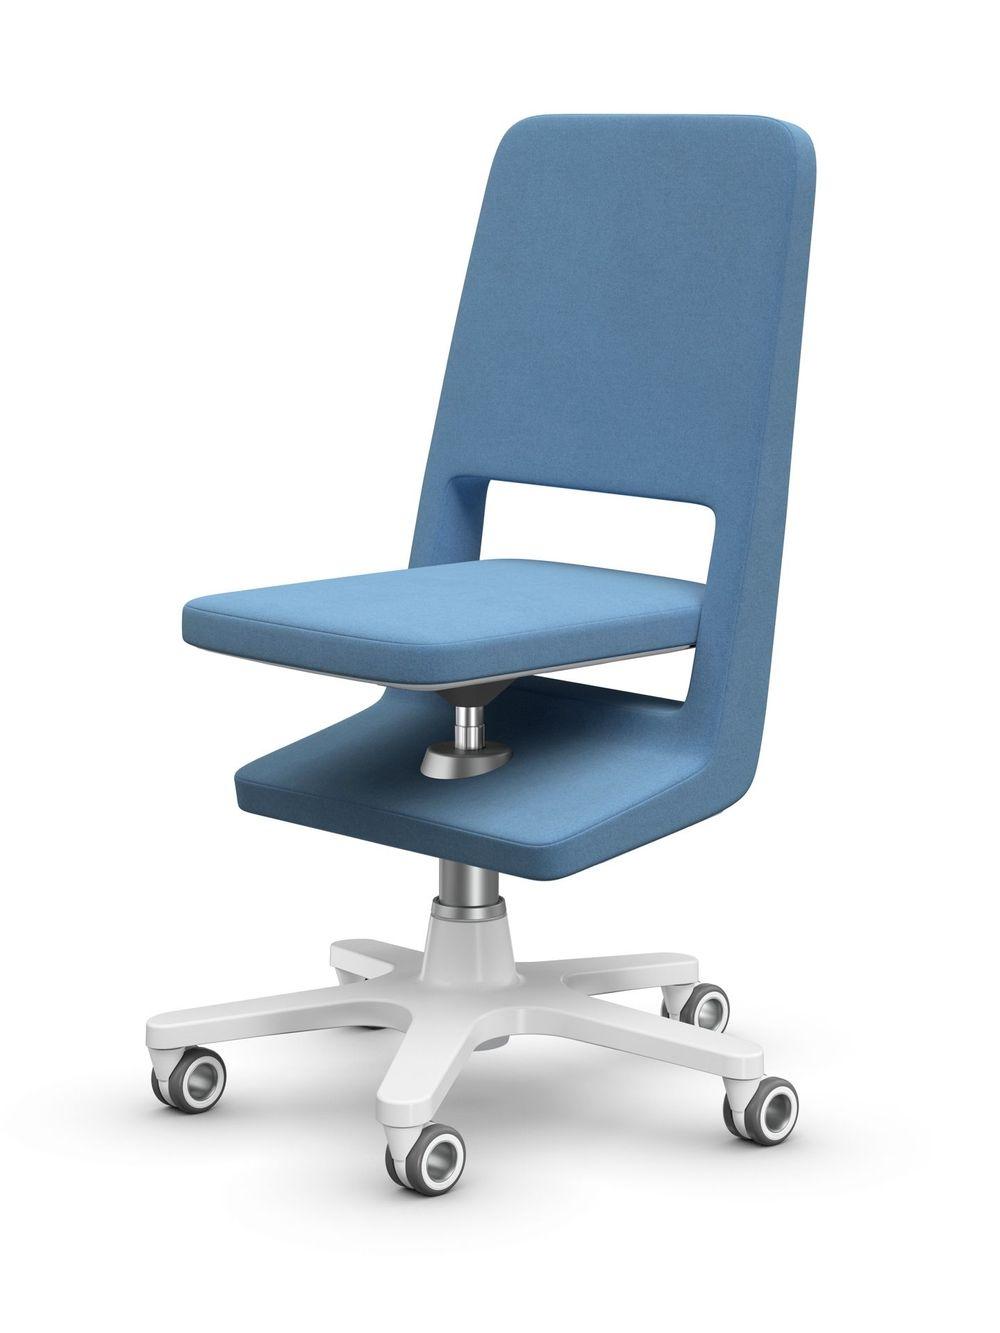 Sedia ergonomica Moll S9